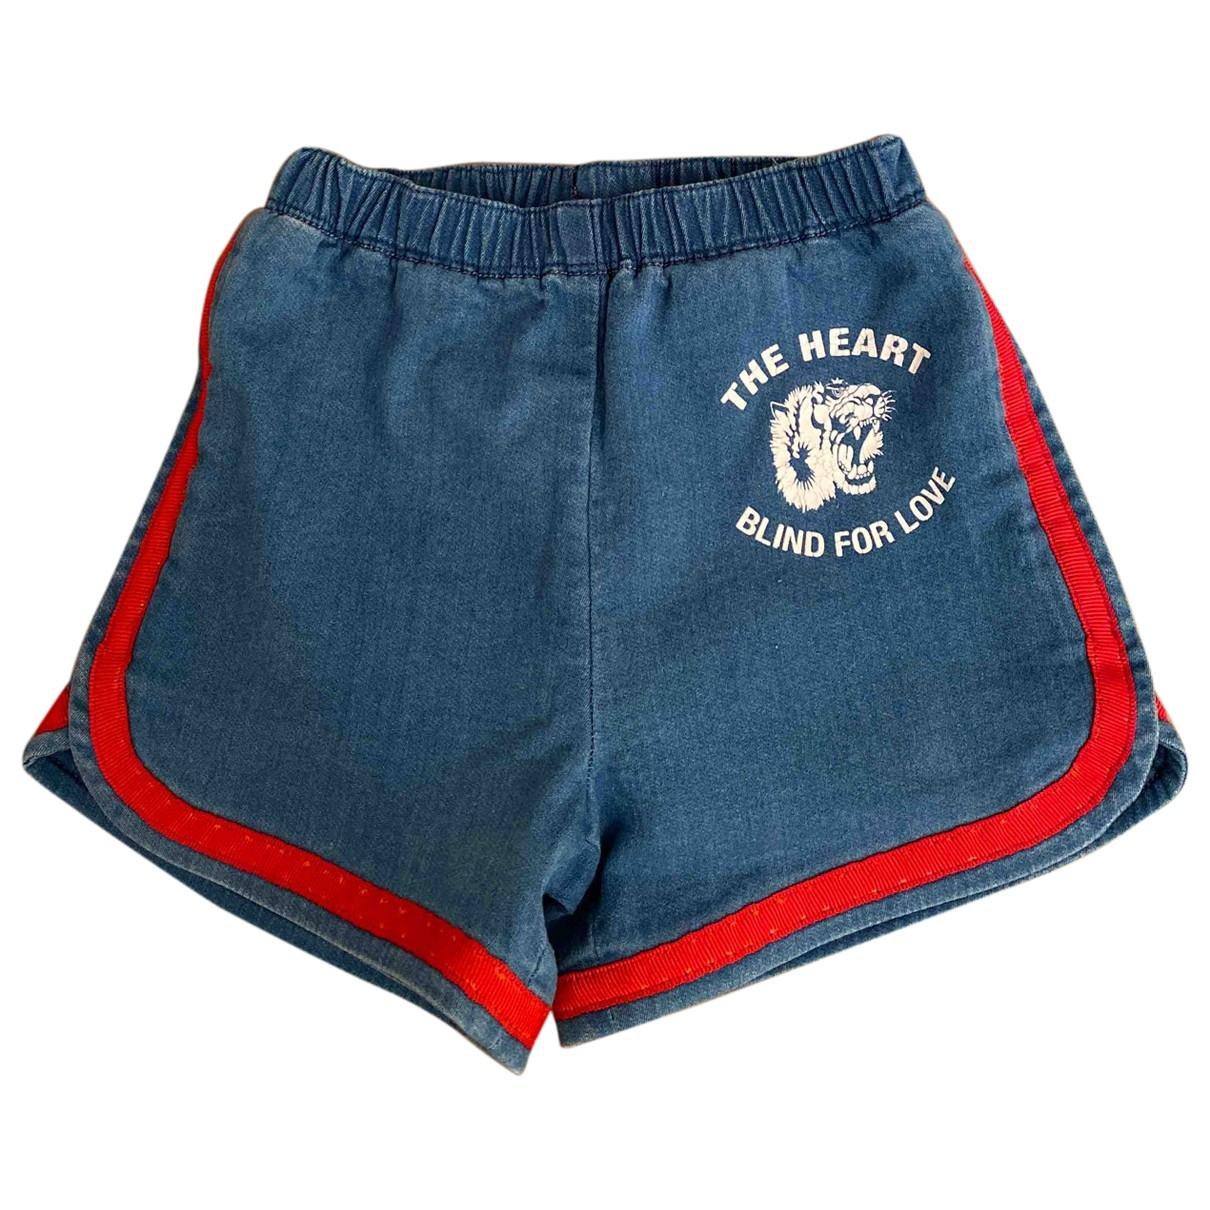 Gucci \N Blue Denim - Jeans Shorts for Kids 18 months - up to 81cm FR